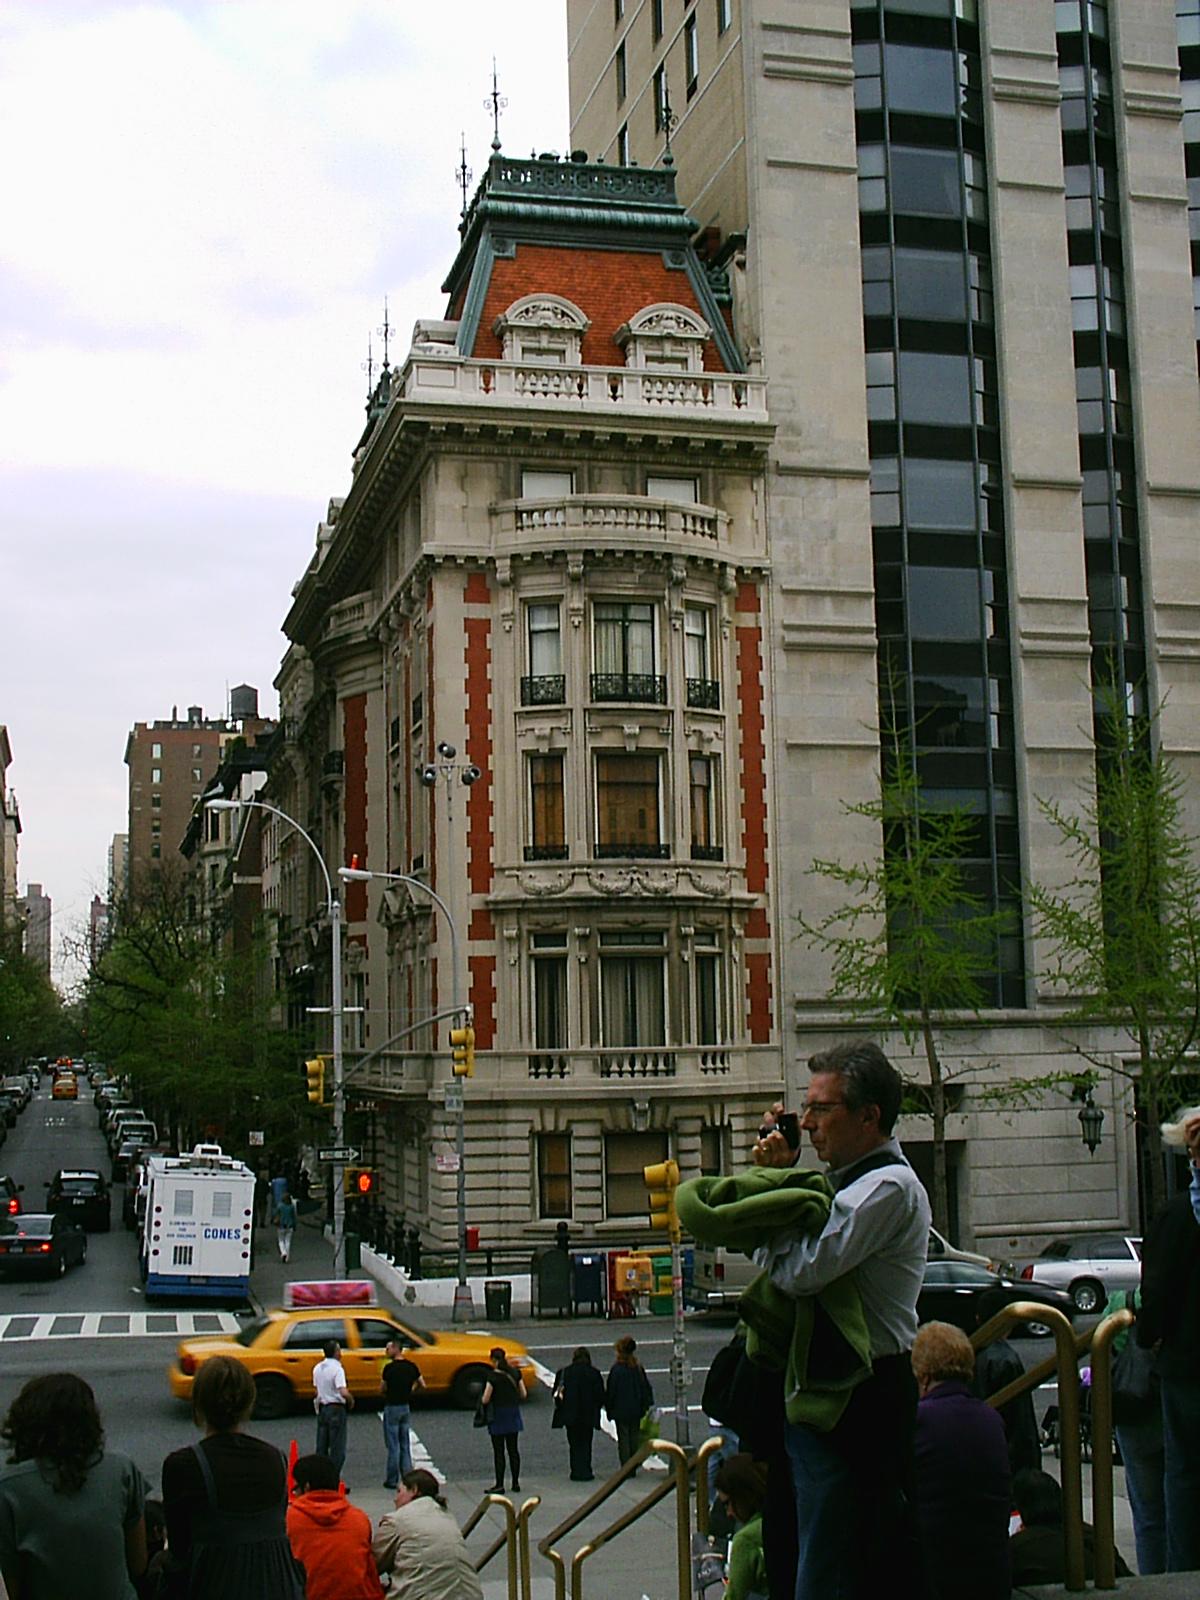 New York city street, Building, Busy, Cars, City, HQ Photo